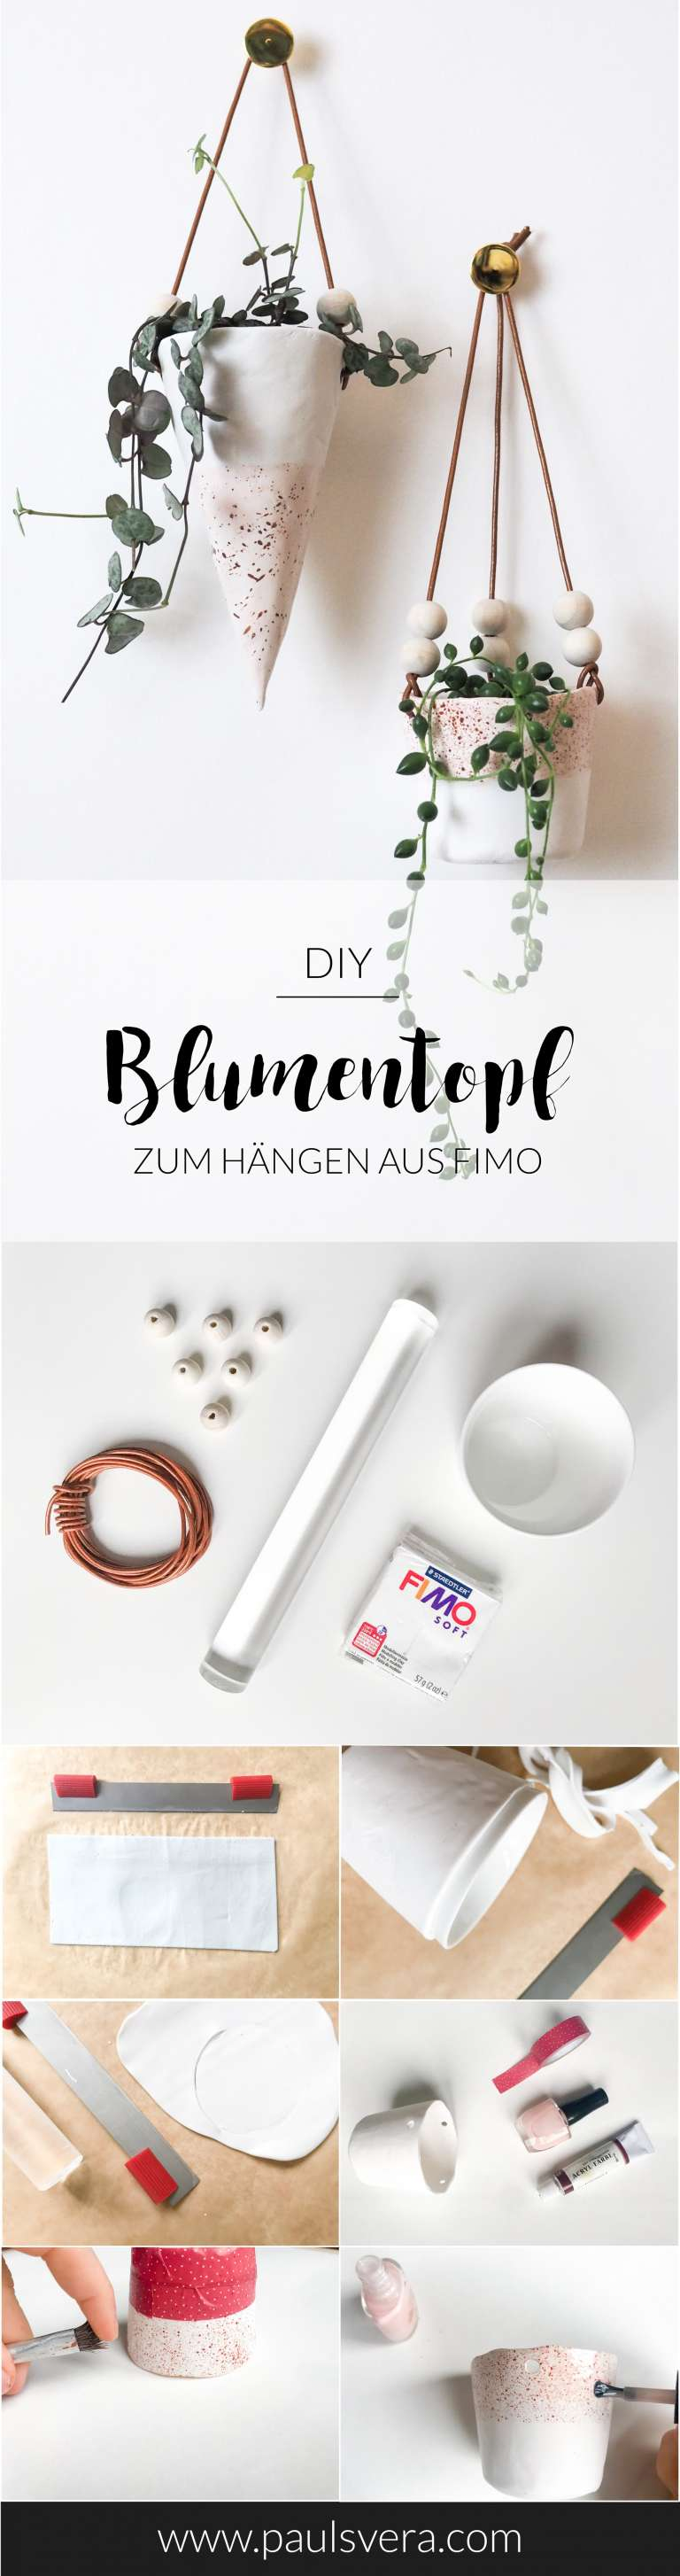 Anleitung-Blumentopf-aus-Fimo-selber-machen-Geschenke-selber-machen-DIY-Deko-DIY-Zuhause-paulsvera